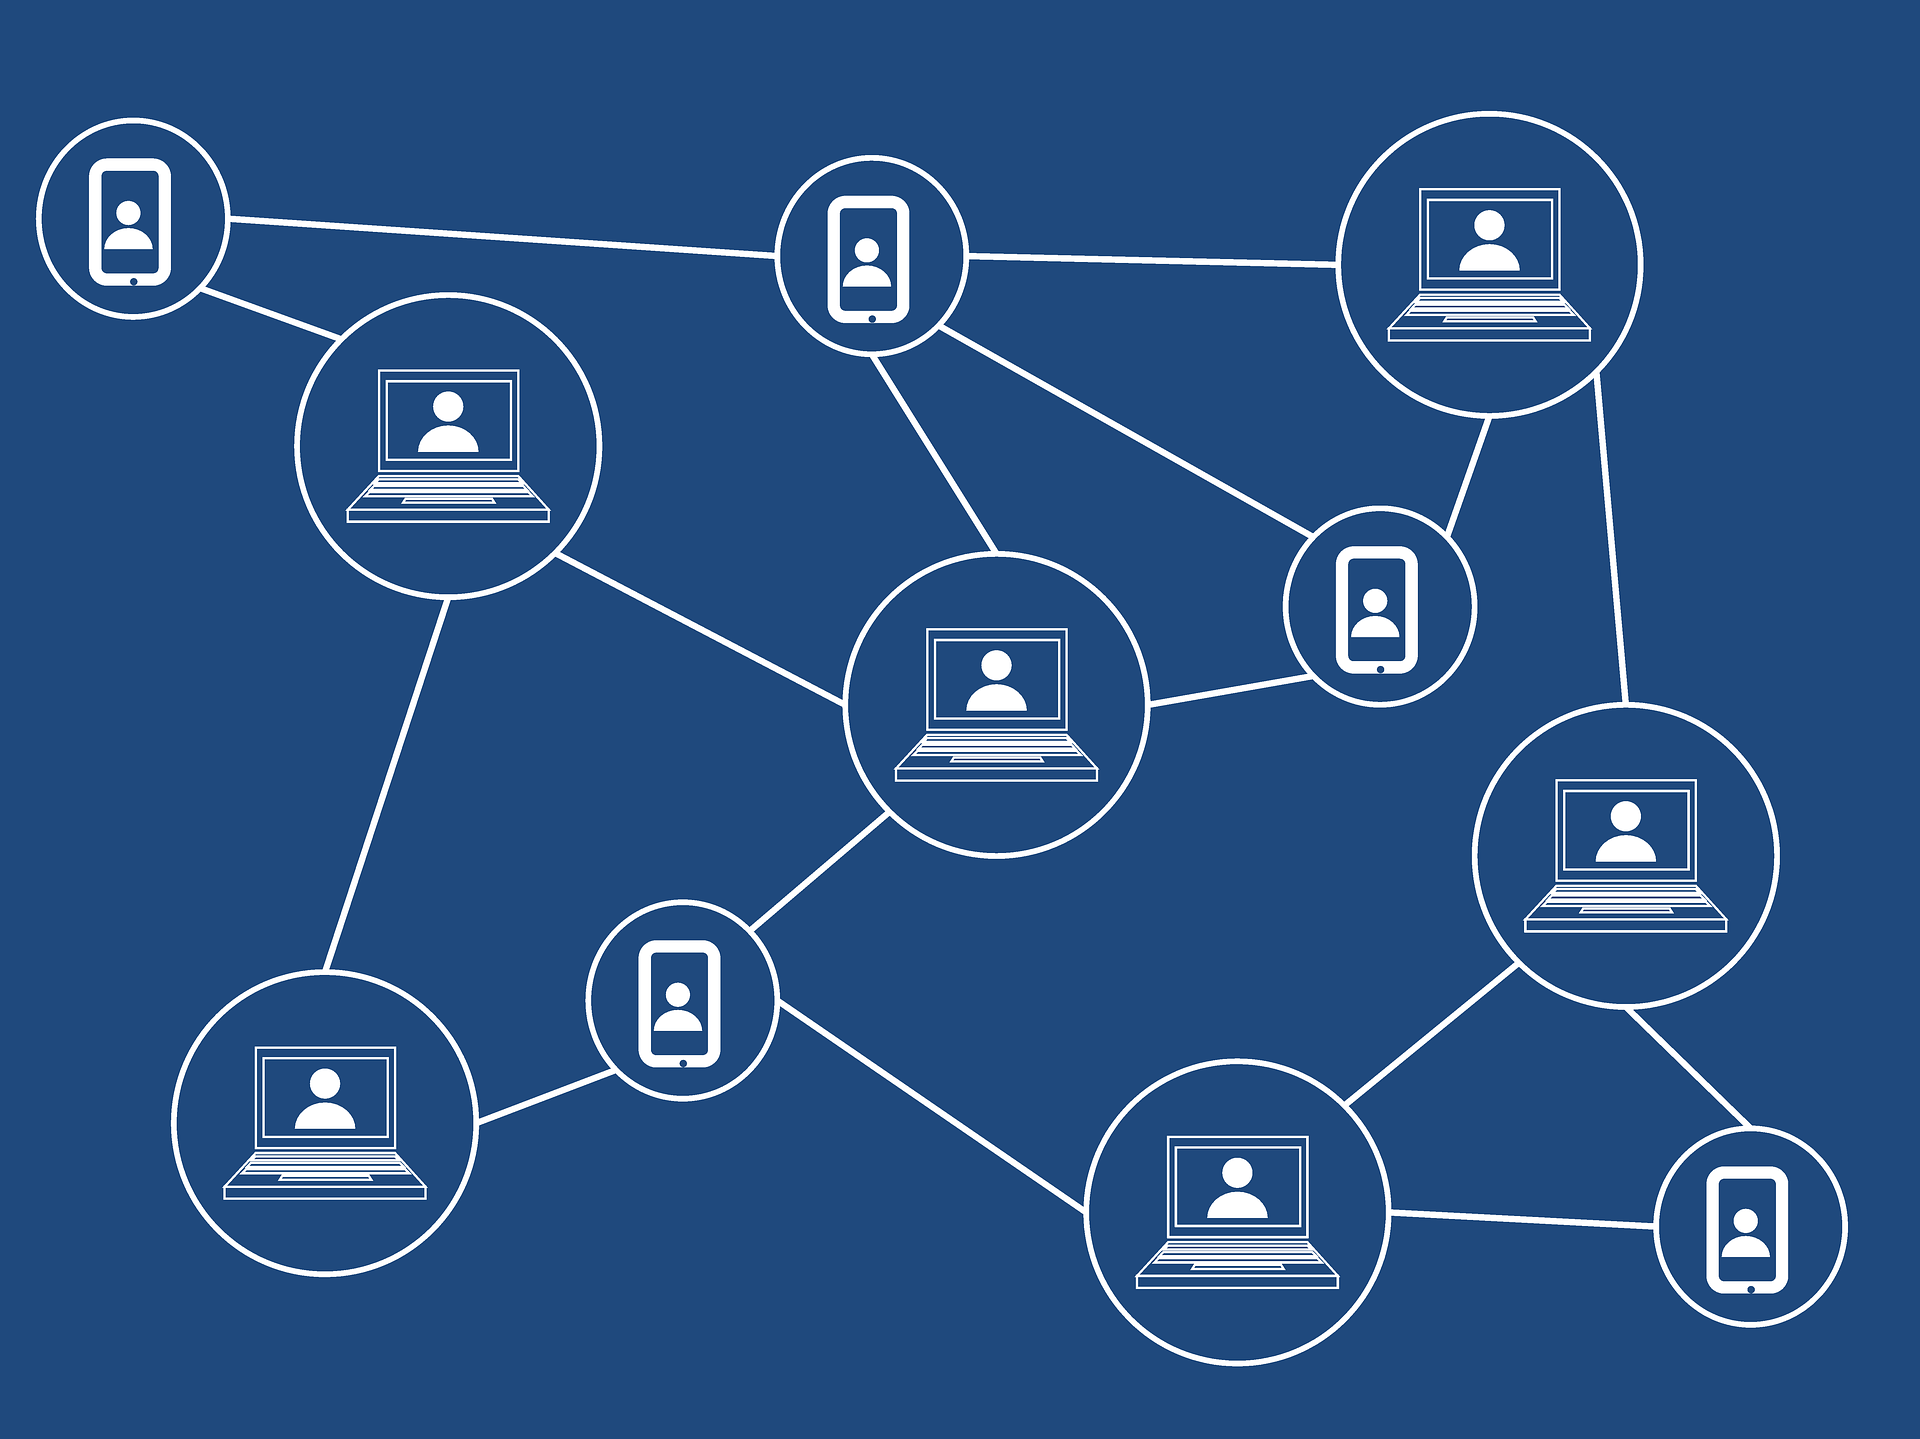 blockchain 3019120 1920 17. Juni 2021